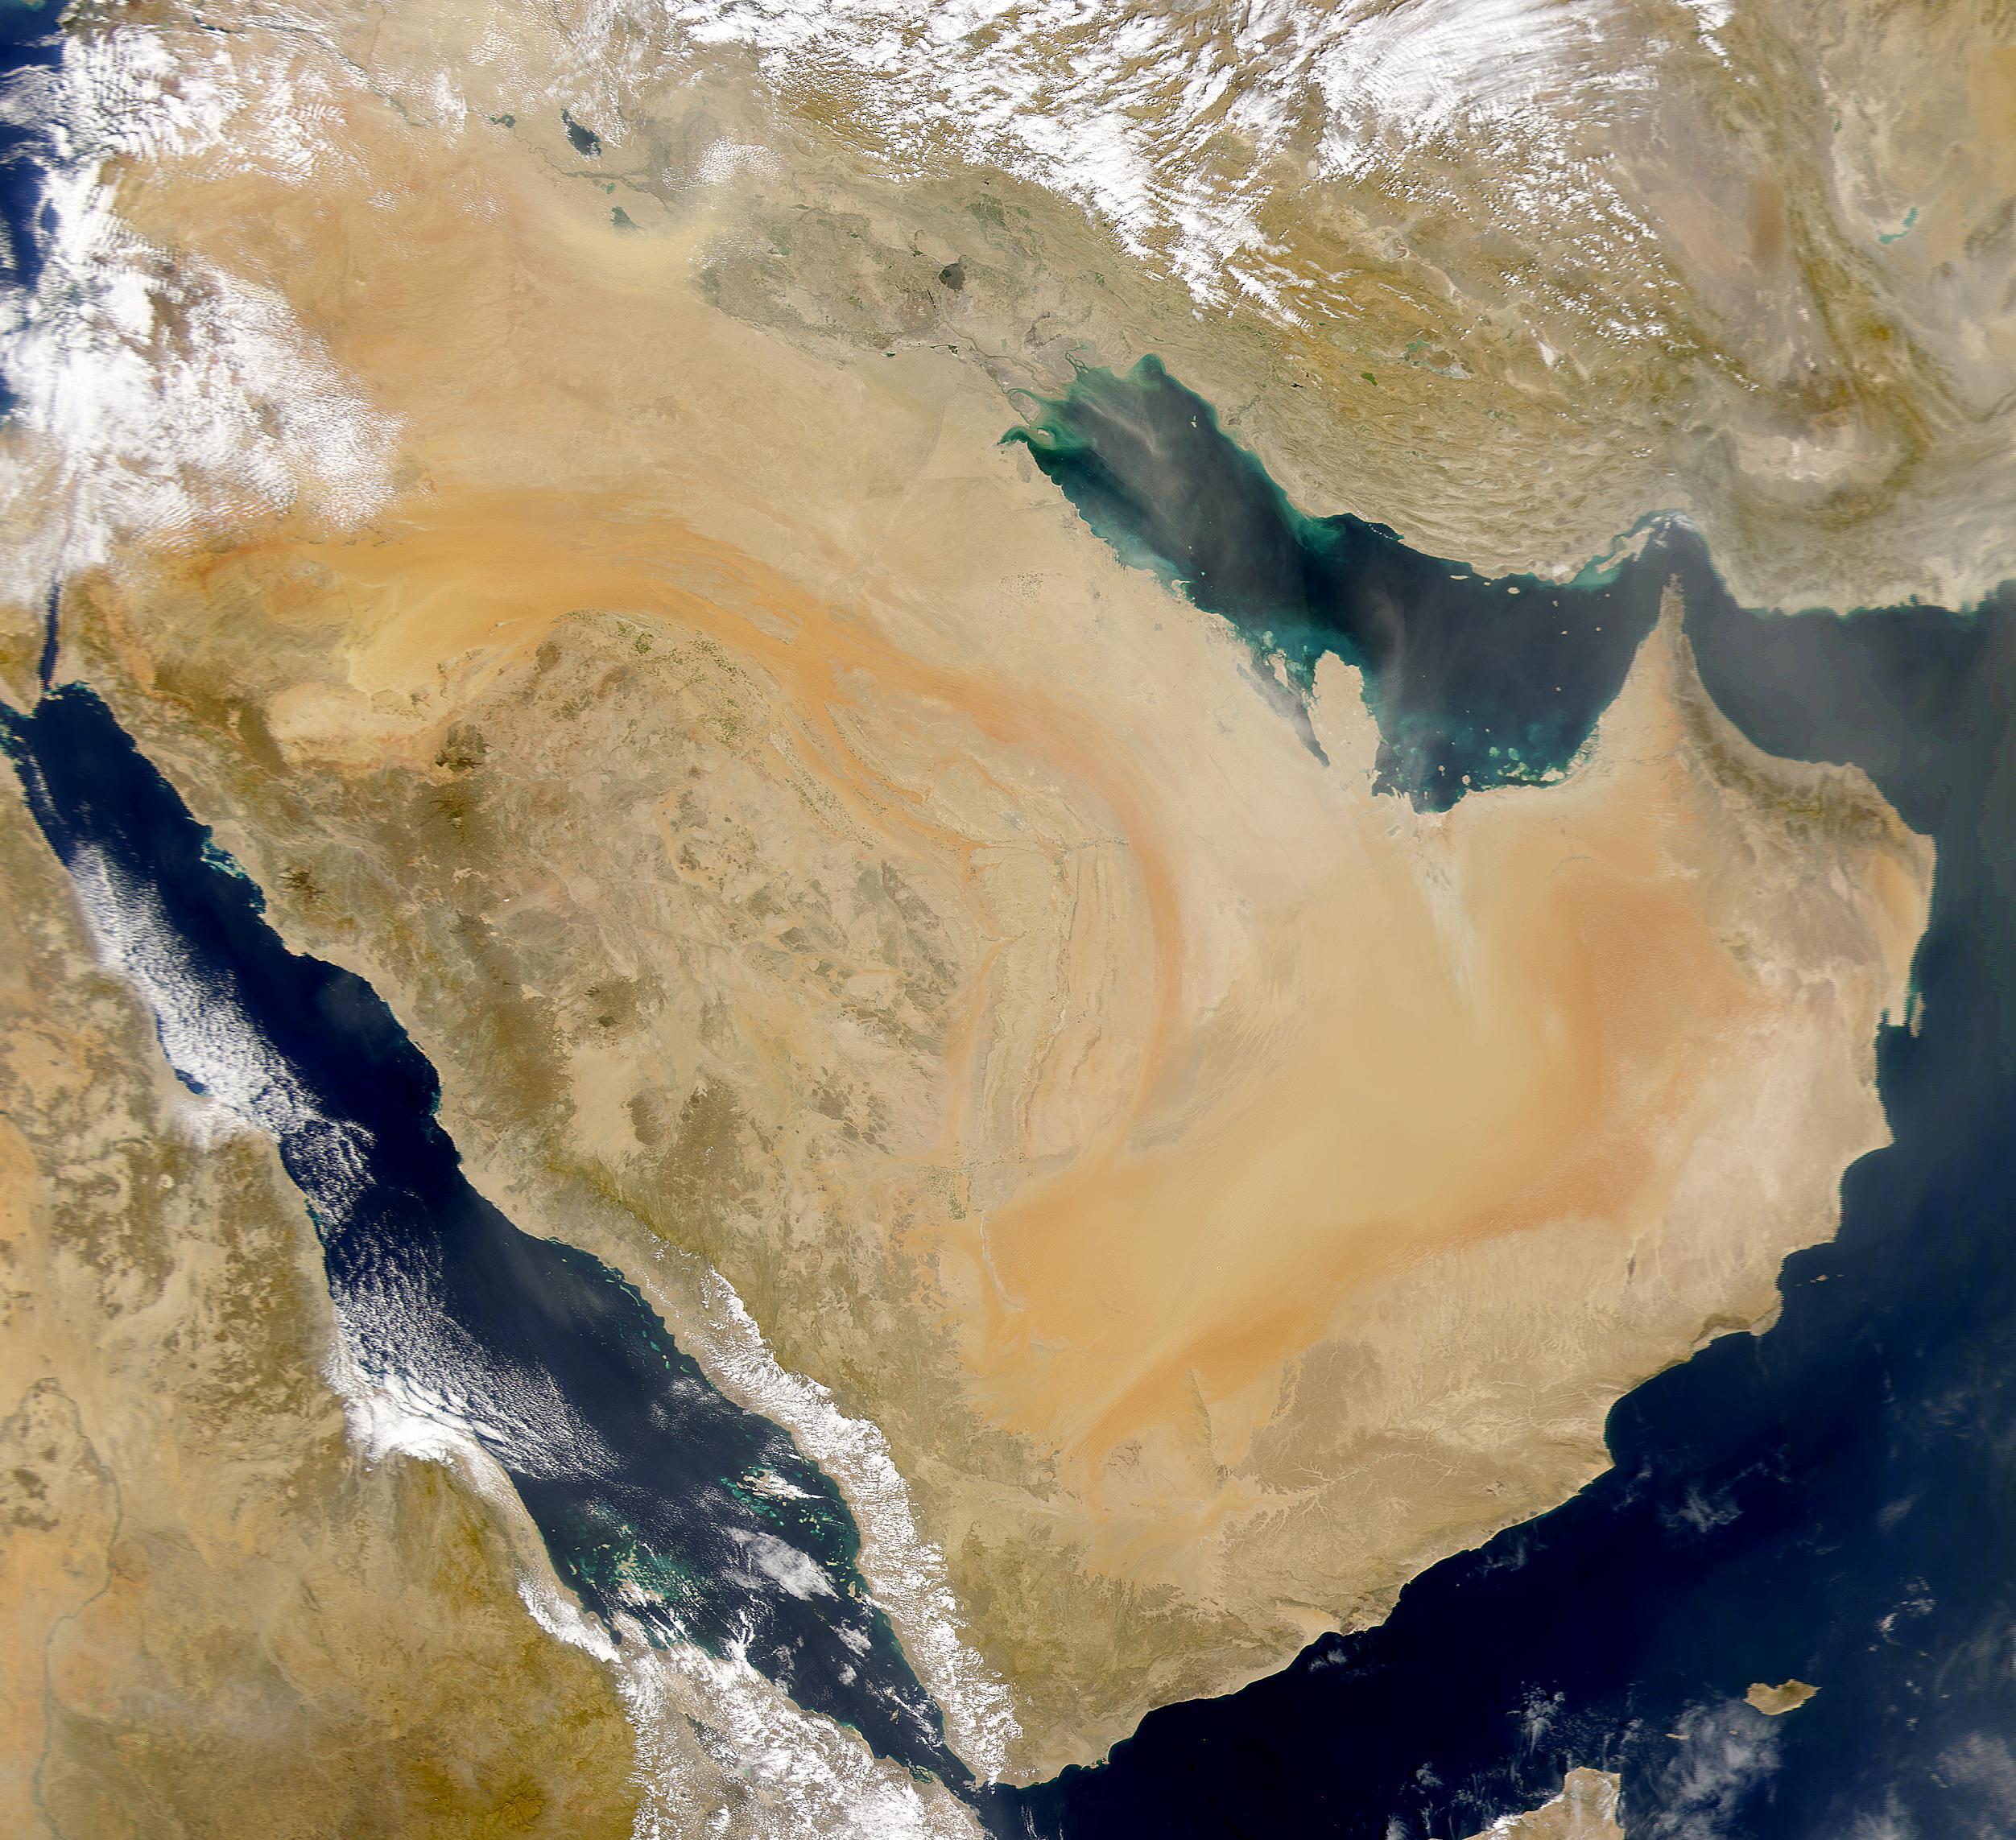 Arabia Saudita y polvareda encima del golfo Pérsico